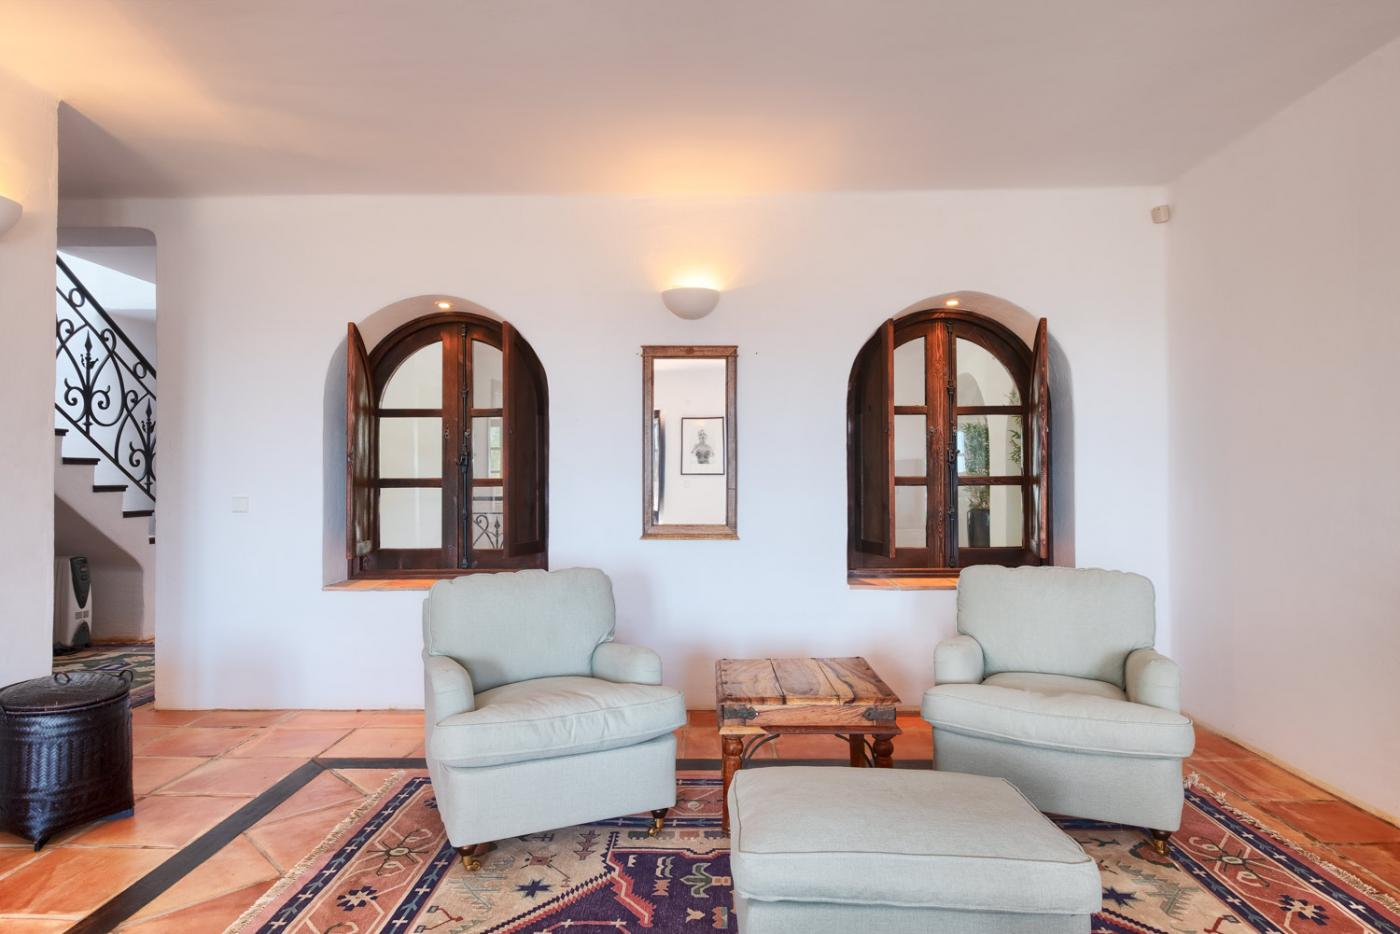 6 Bedroom Coastal Property Country Style Living for Sale in Benahavis